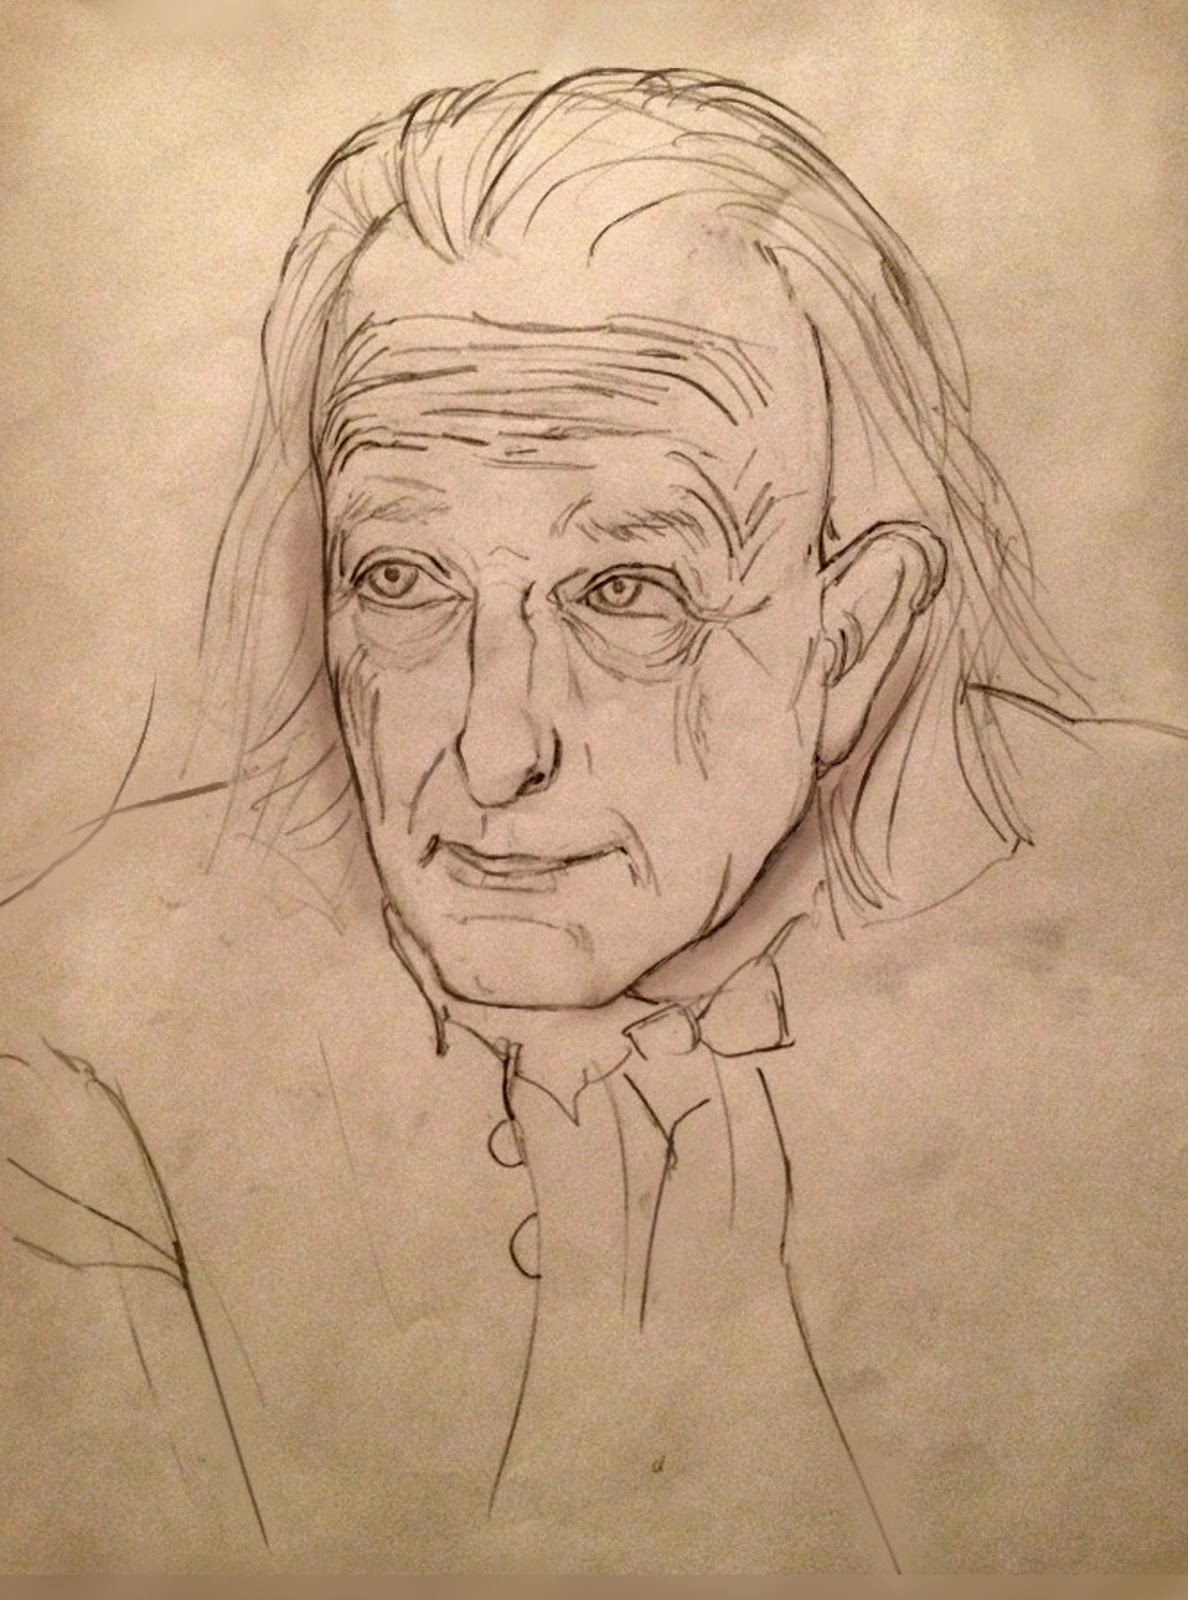 Man S Face Line Drawing : Kevin jick design art bonanza end of first term